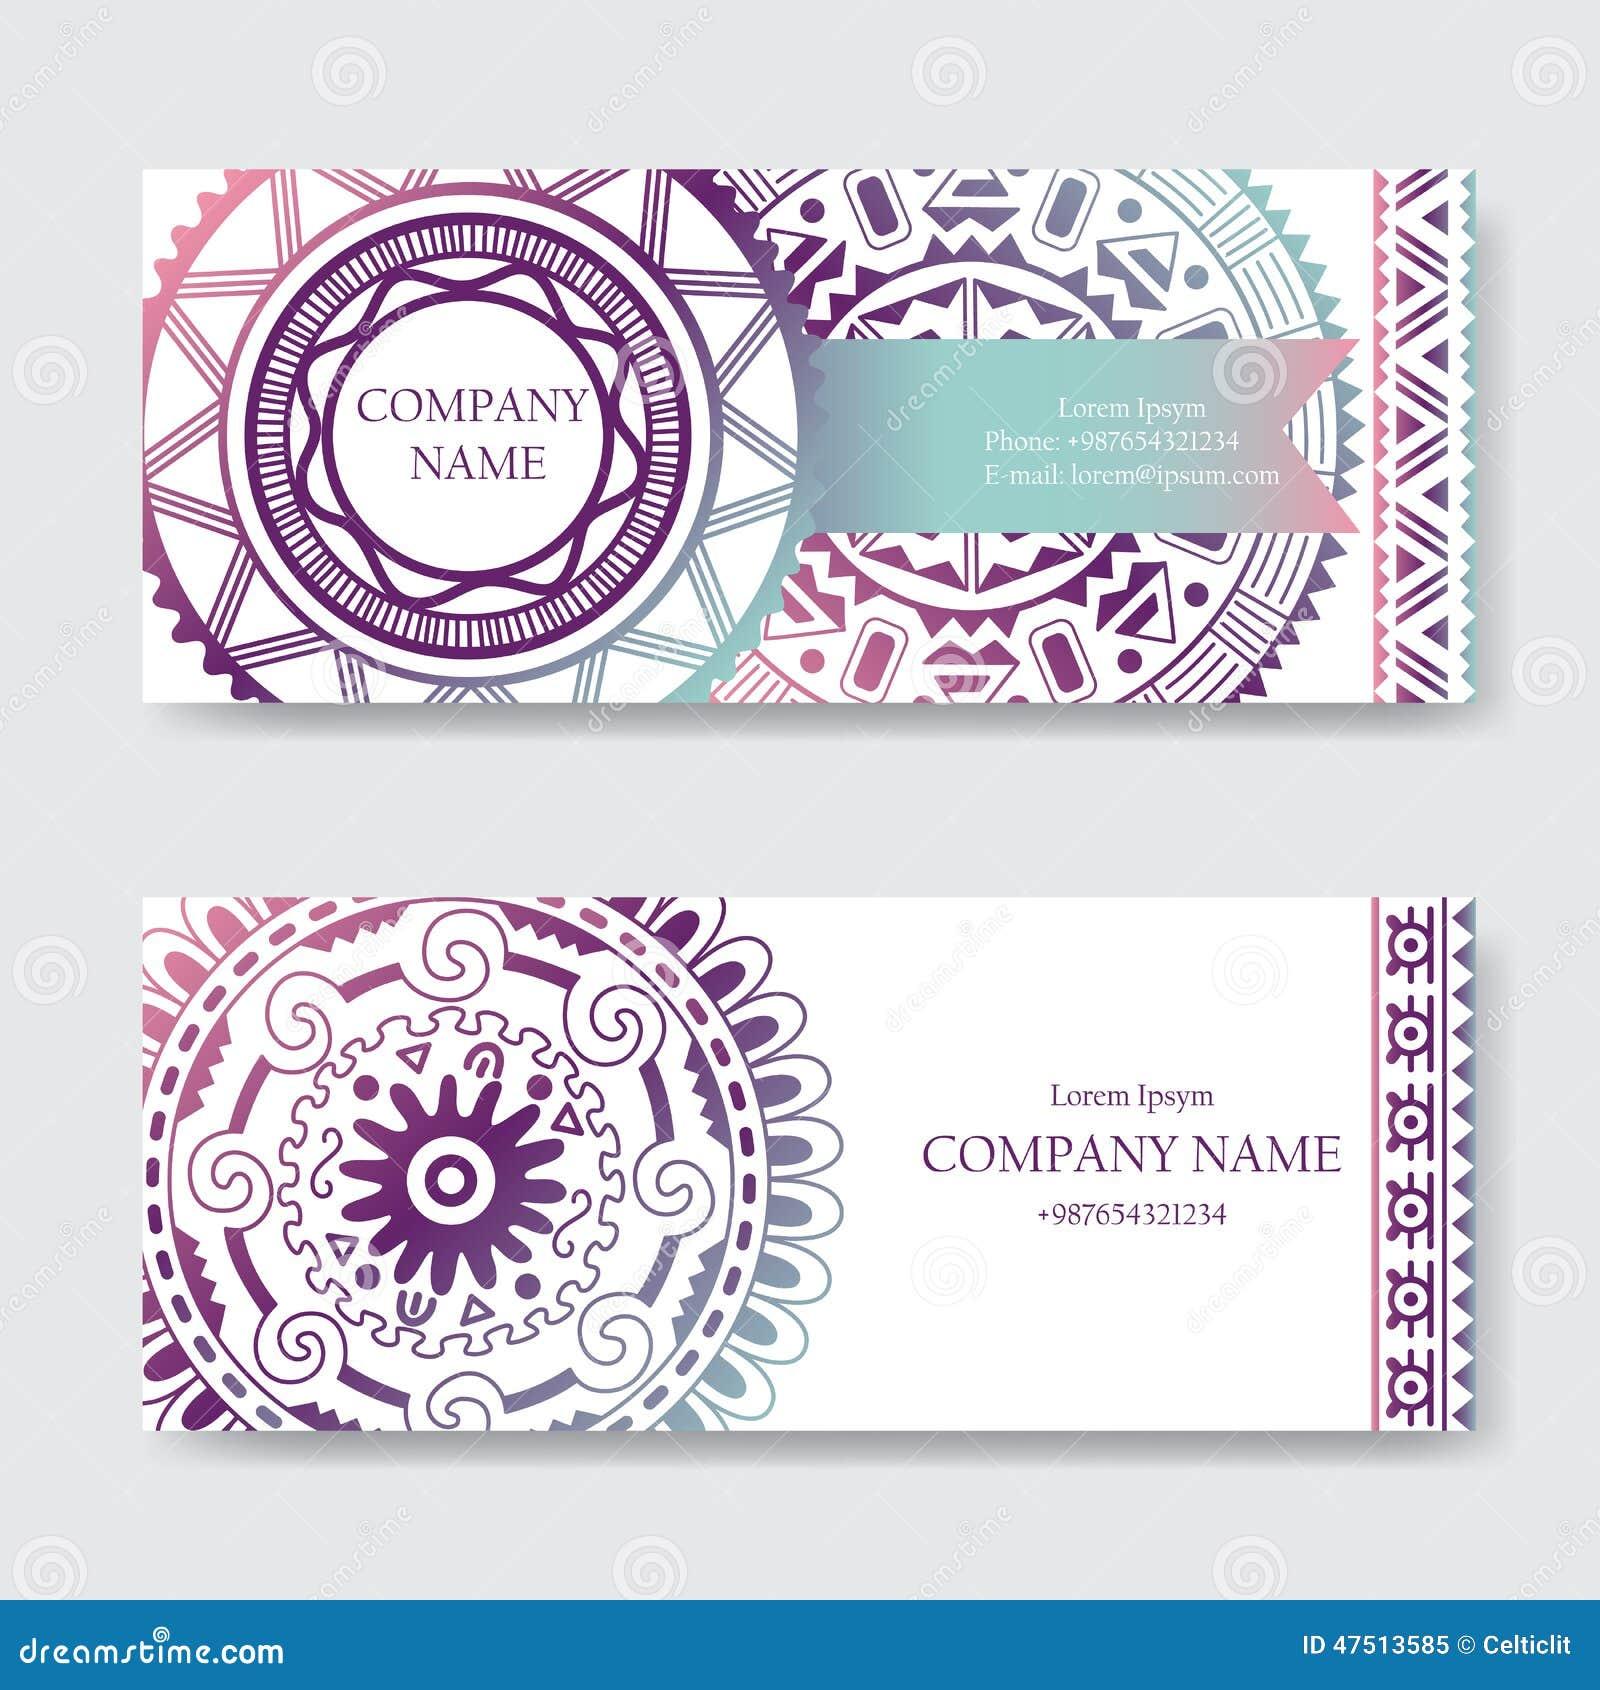 Sistema de plantillas de la tarjeta de visita o de la tarjeta de la invitación